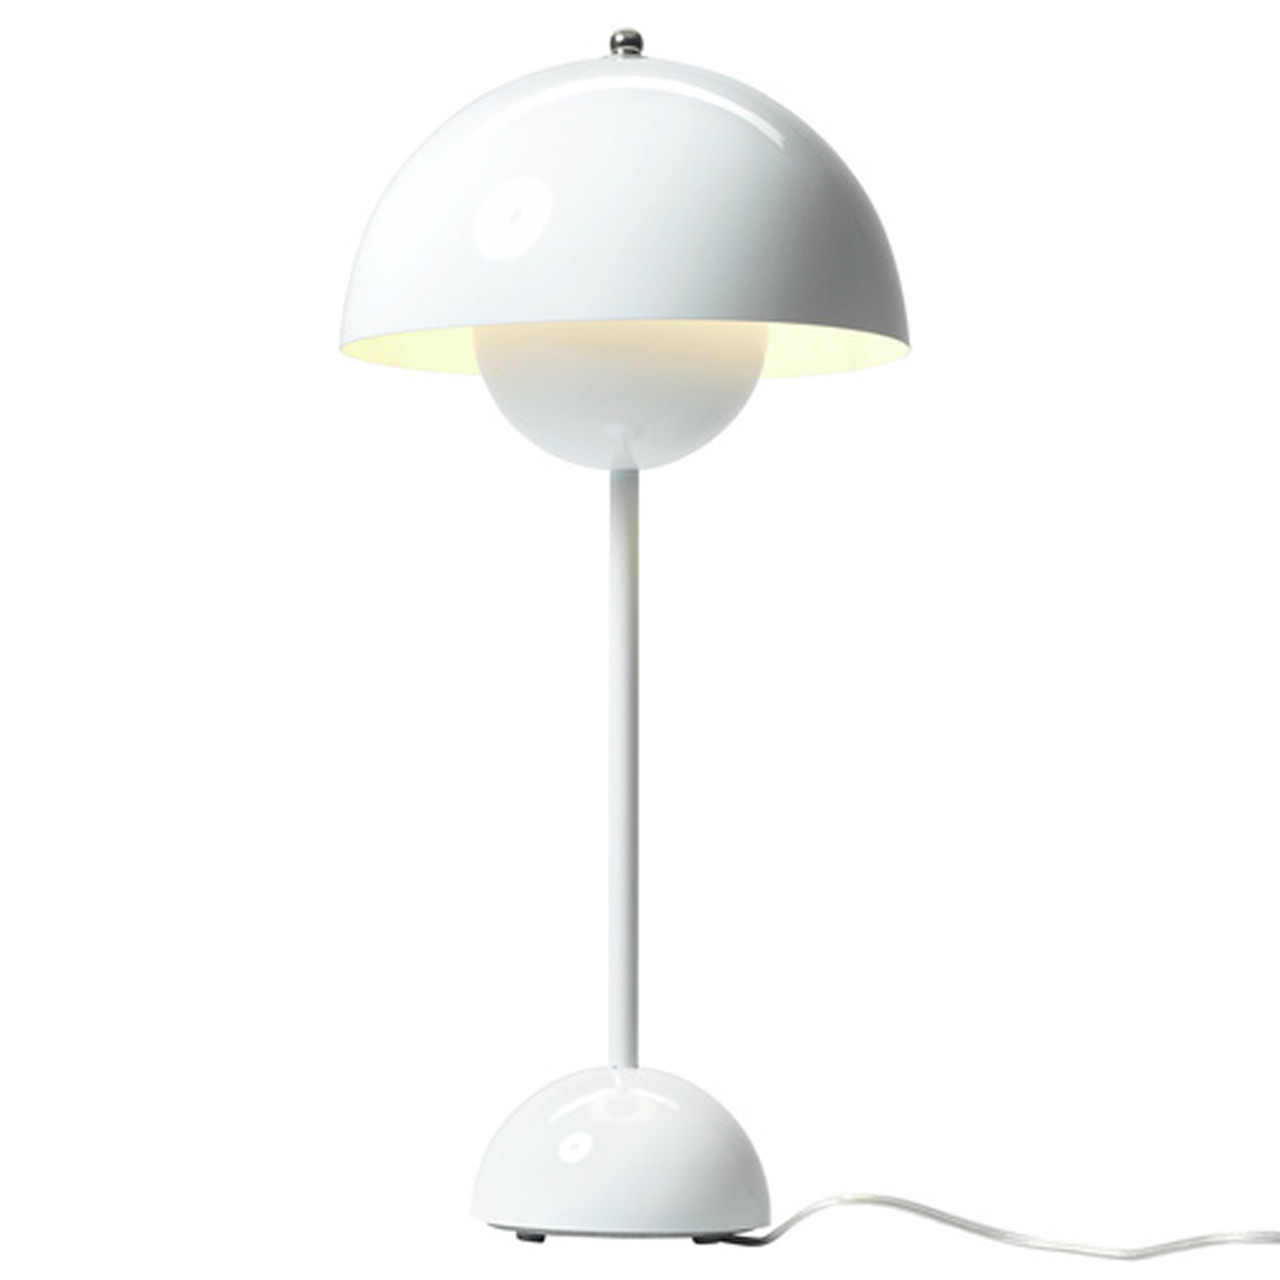 &Tradition FlowerPot Bordlampe VP3 fra &Tradition